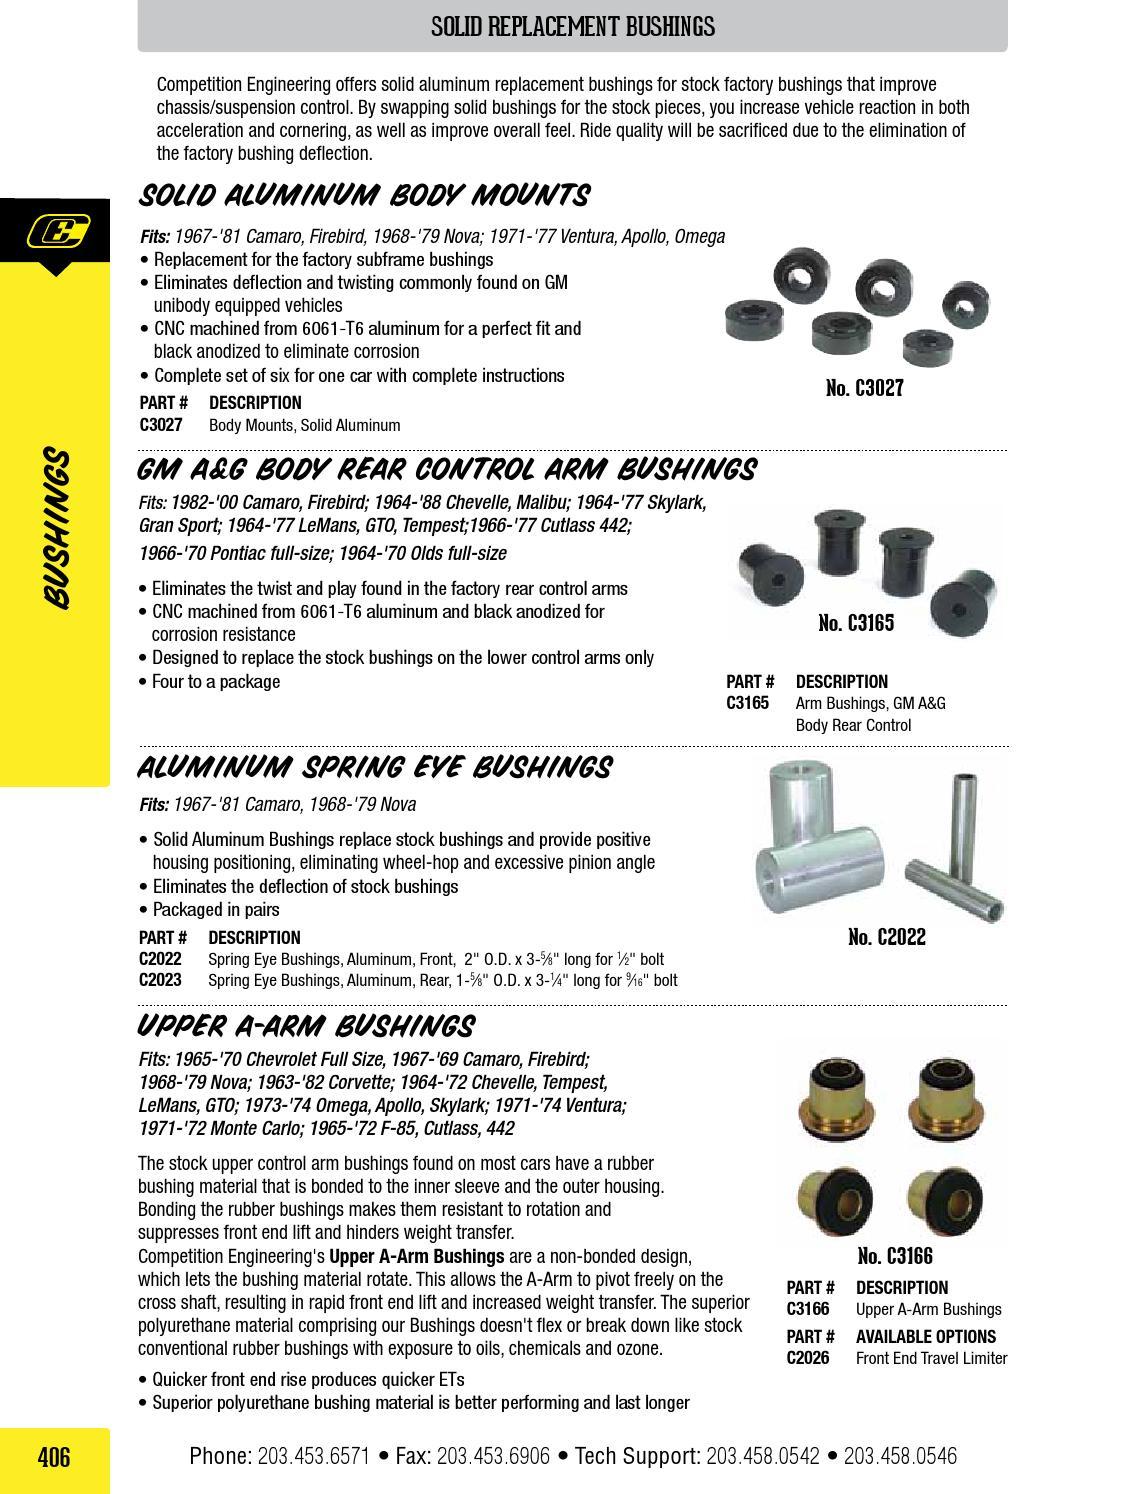 Competition Engineering C3027 Aluminum Body Mount